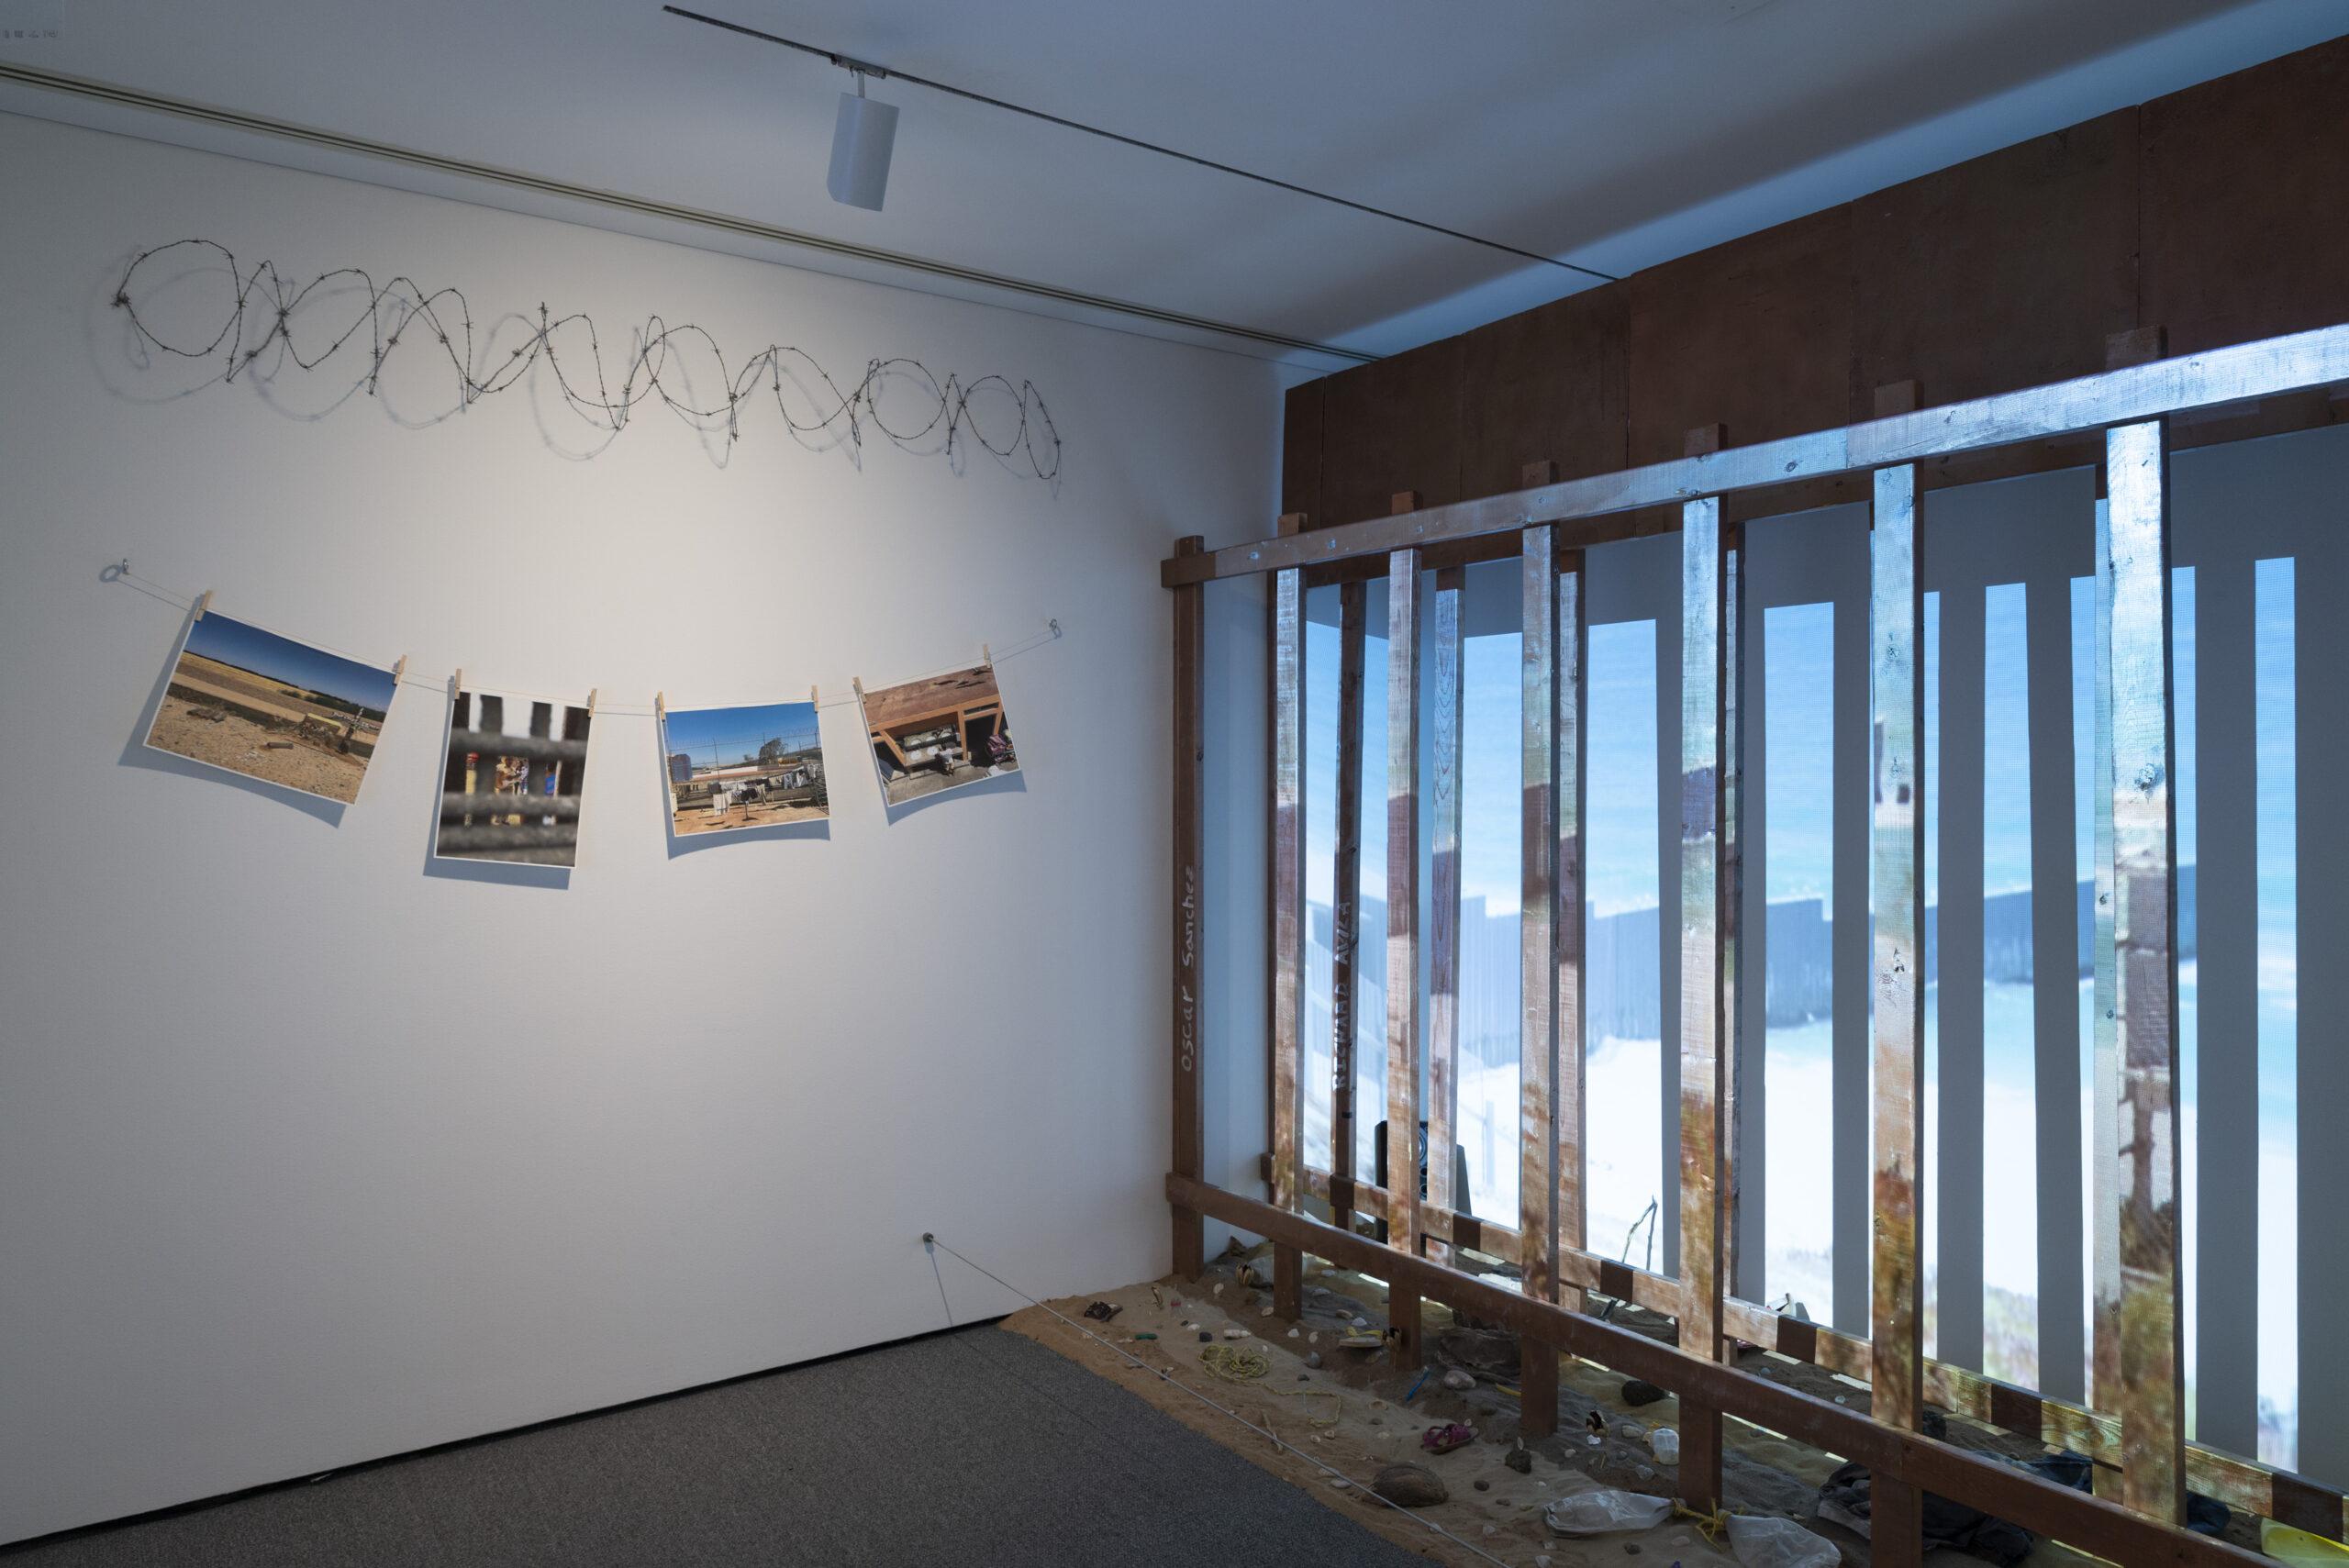 Installation detail of Erick Antonio Benitez's Esta Tierra Es Tu Tierra (This Land Is Your Land). Photo by Mitro Hood.